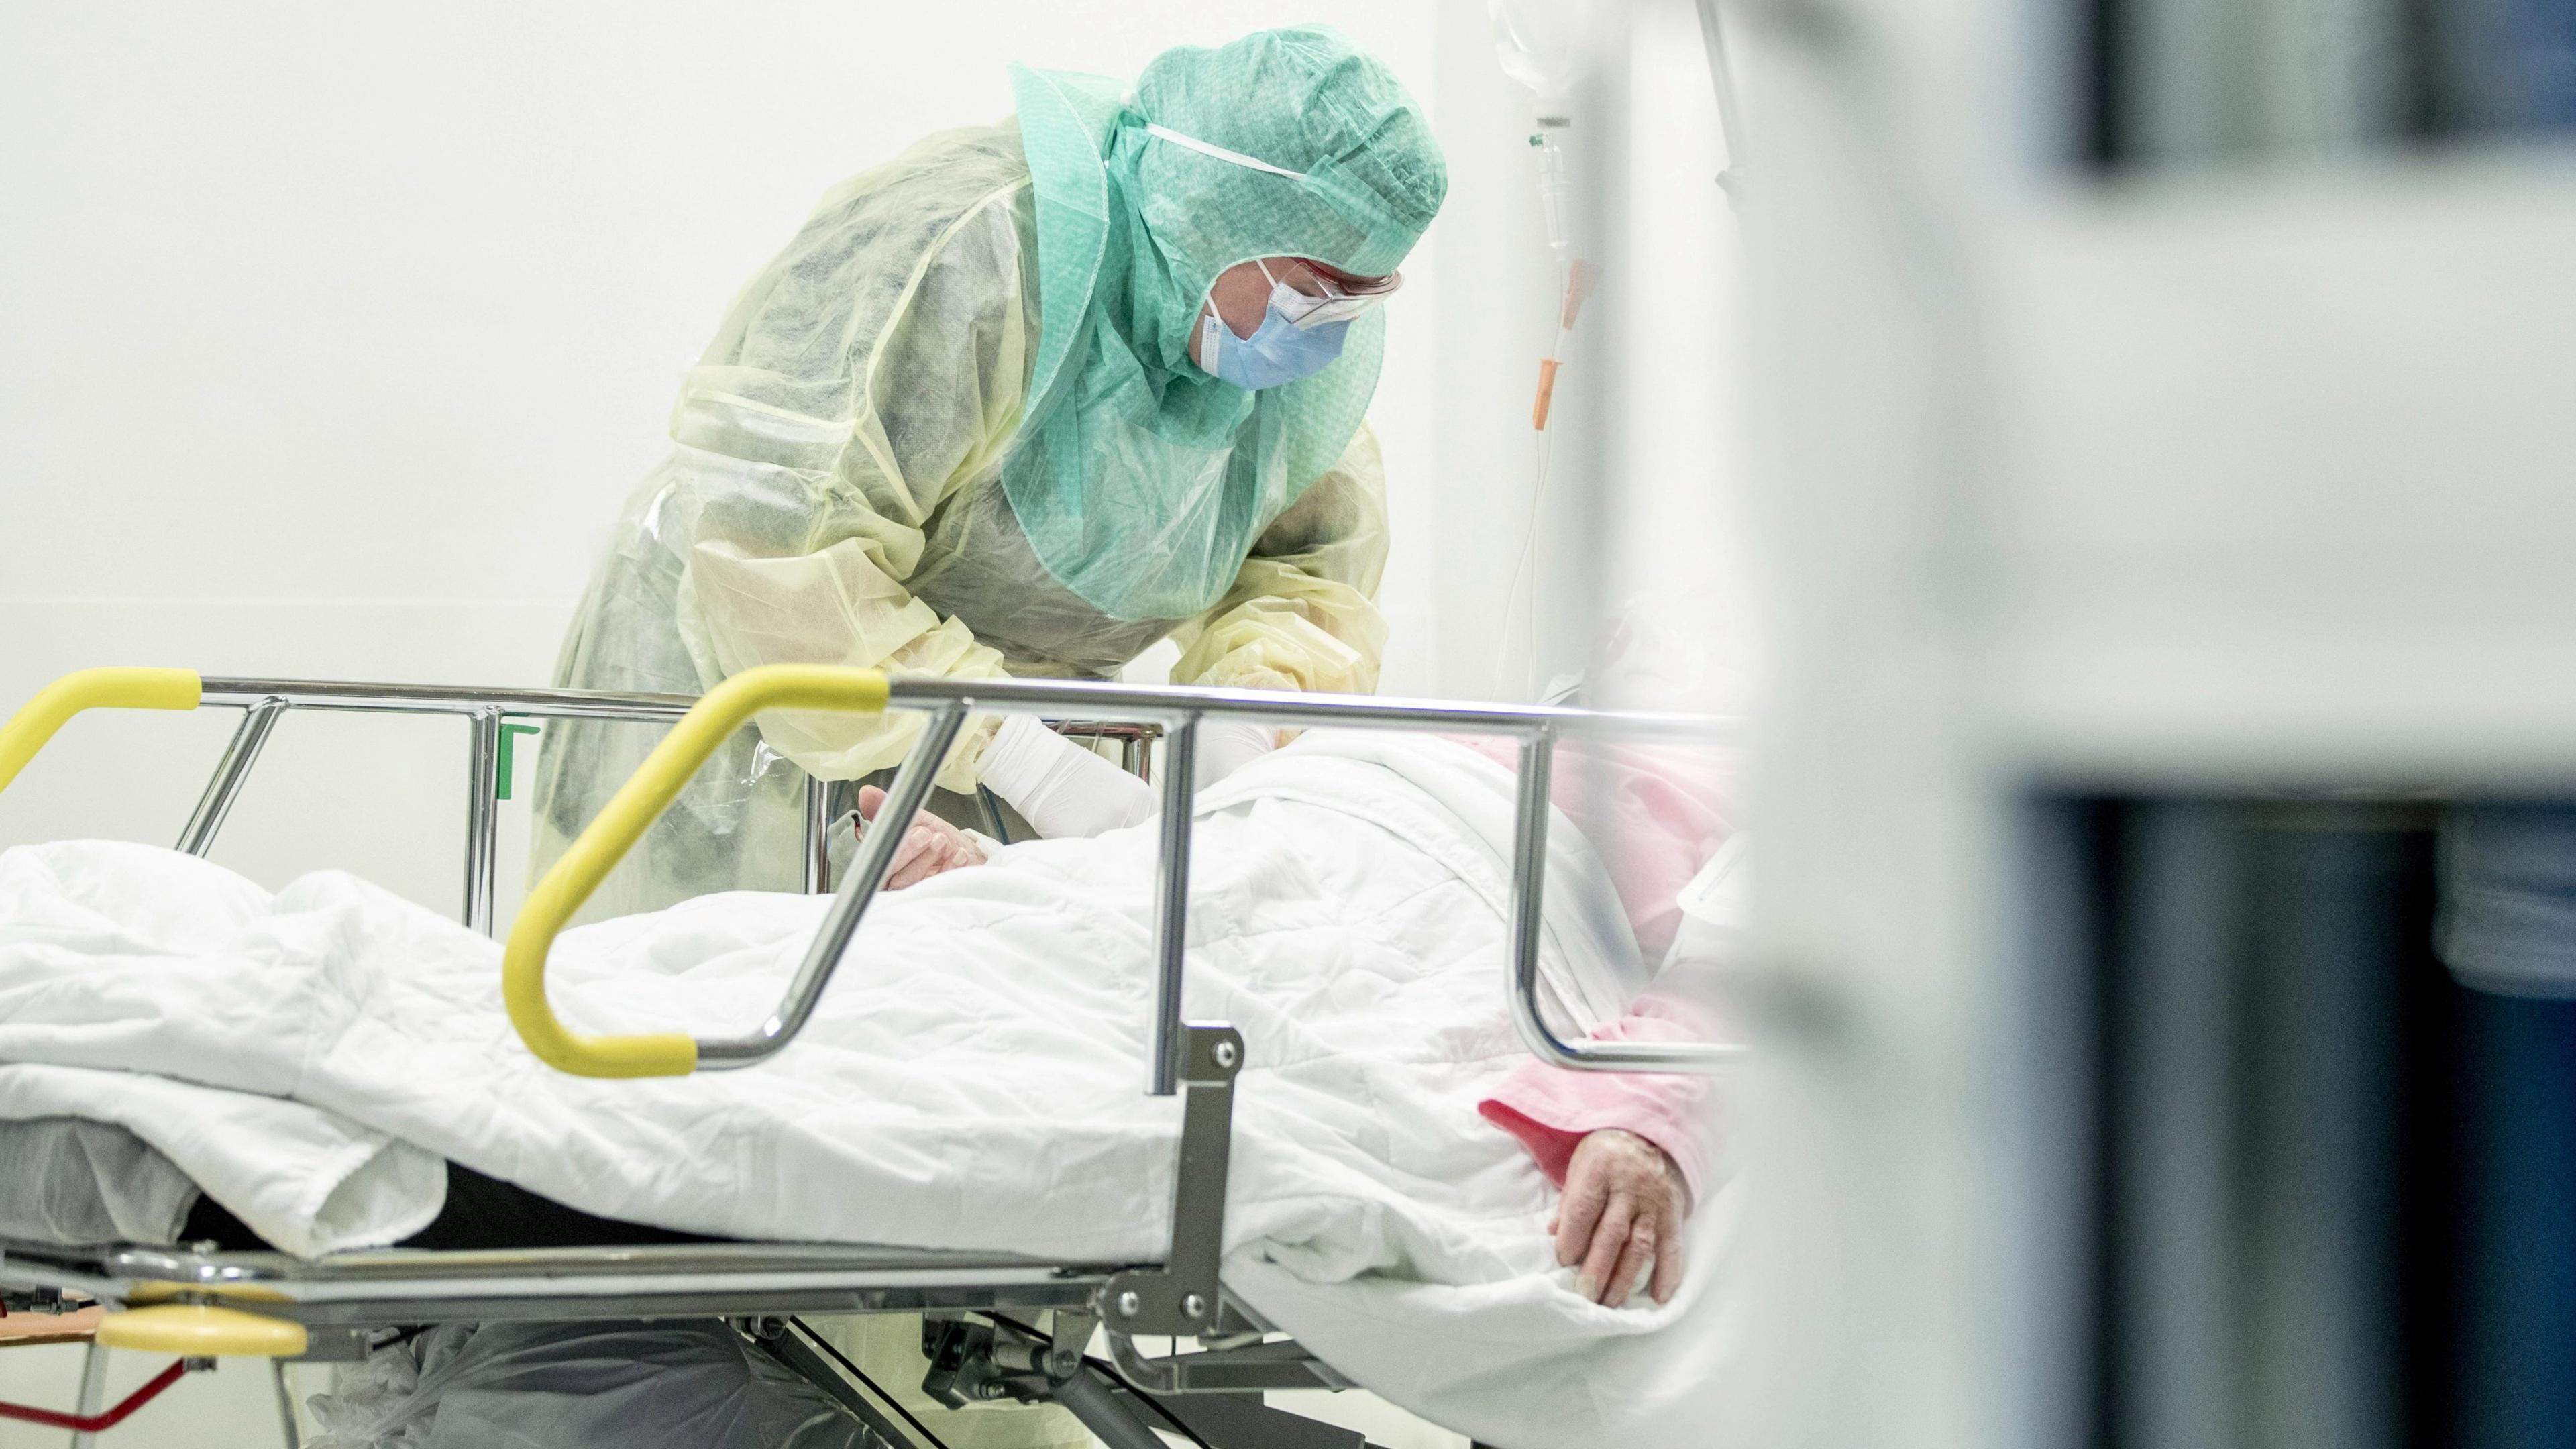 Фенофибрат снизил вирусную нагрузку при Covid-19 с эффективностью до 70%